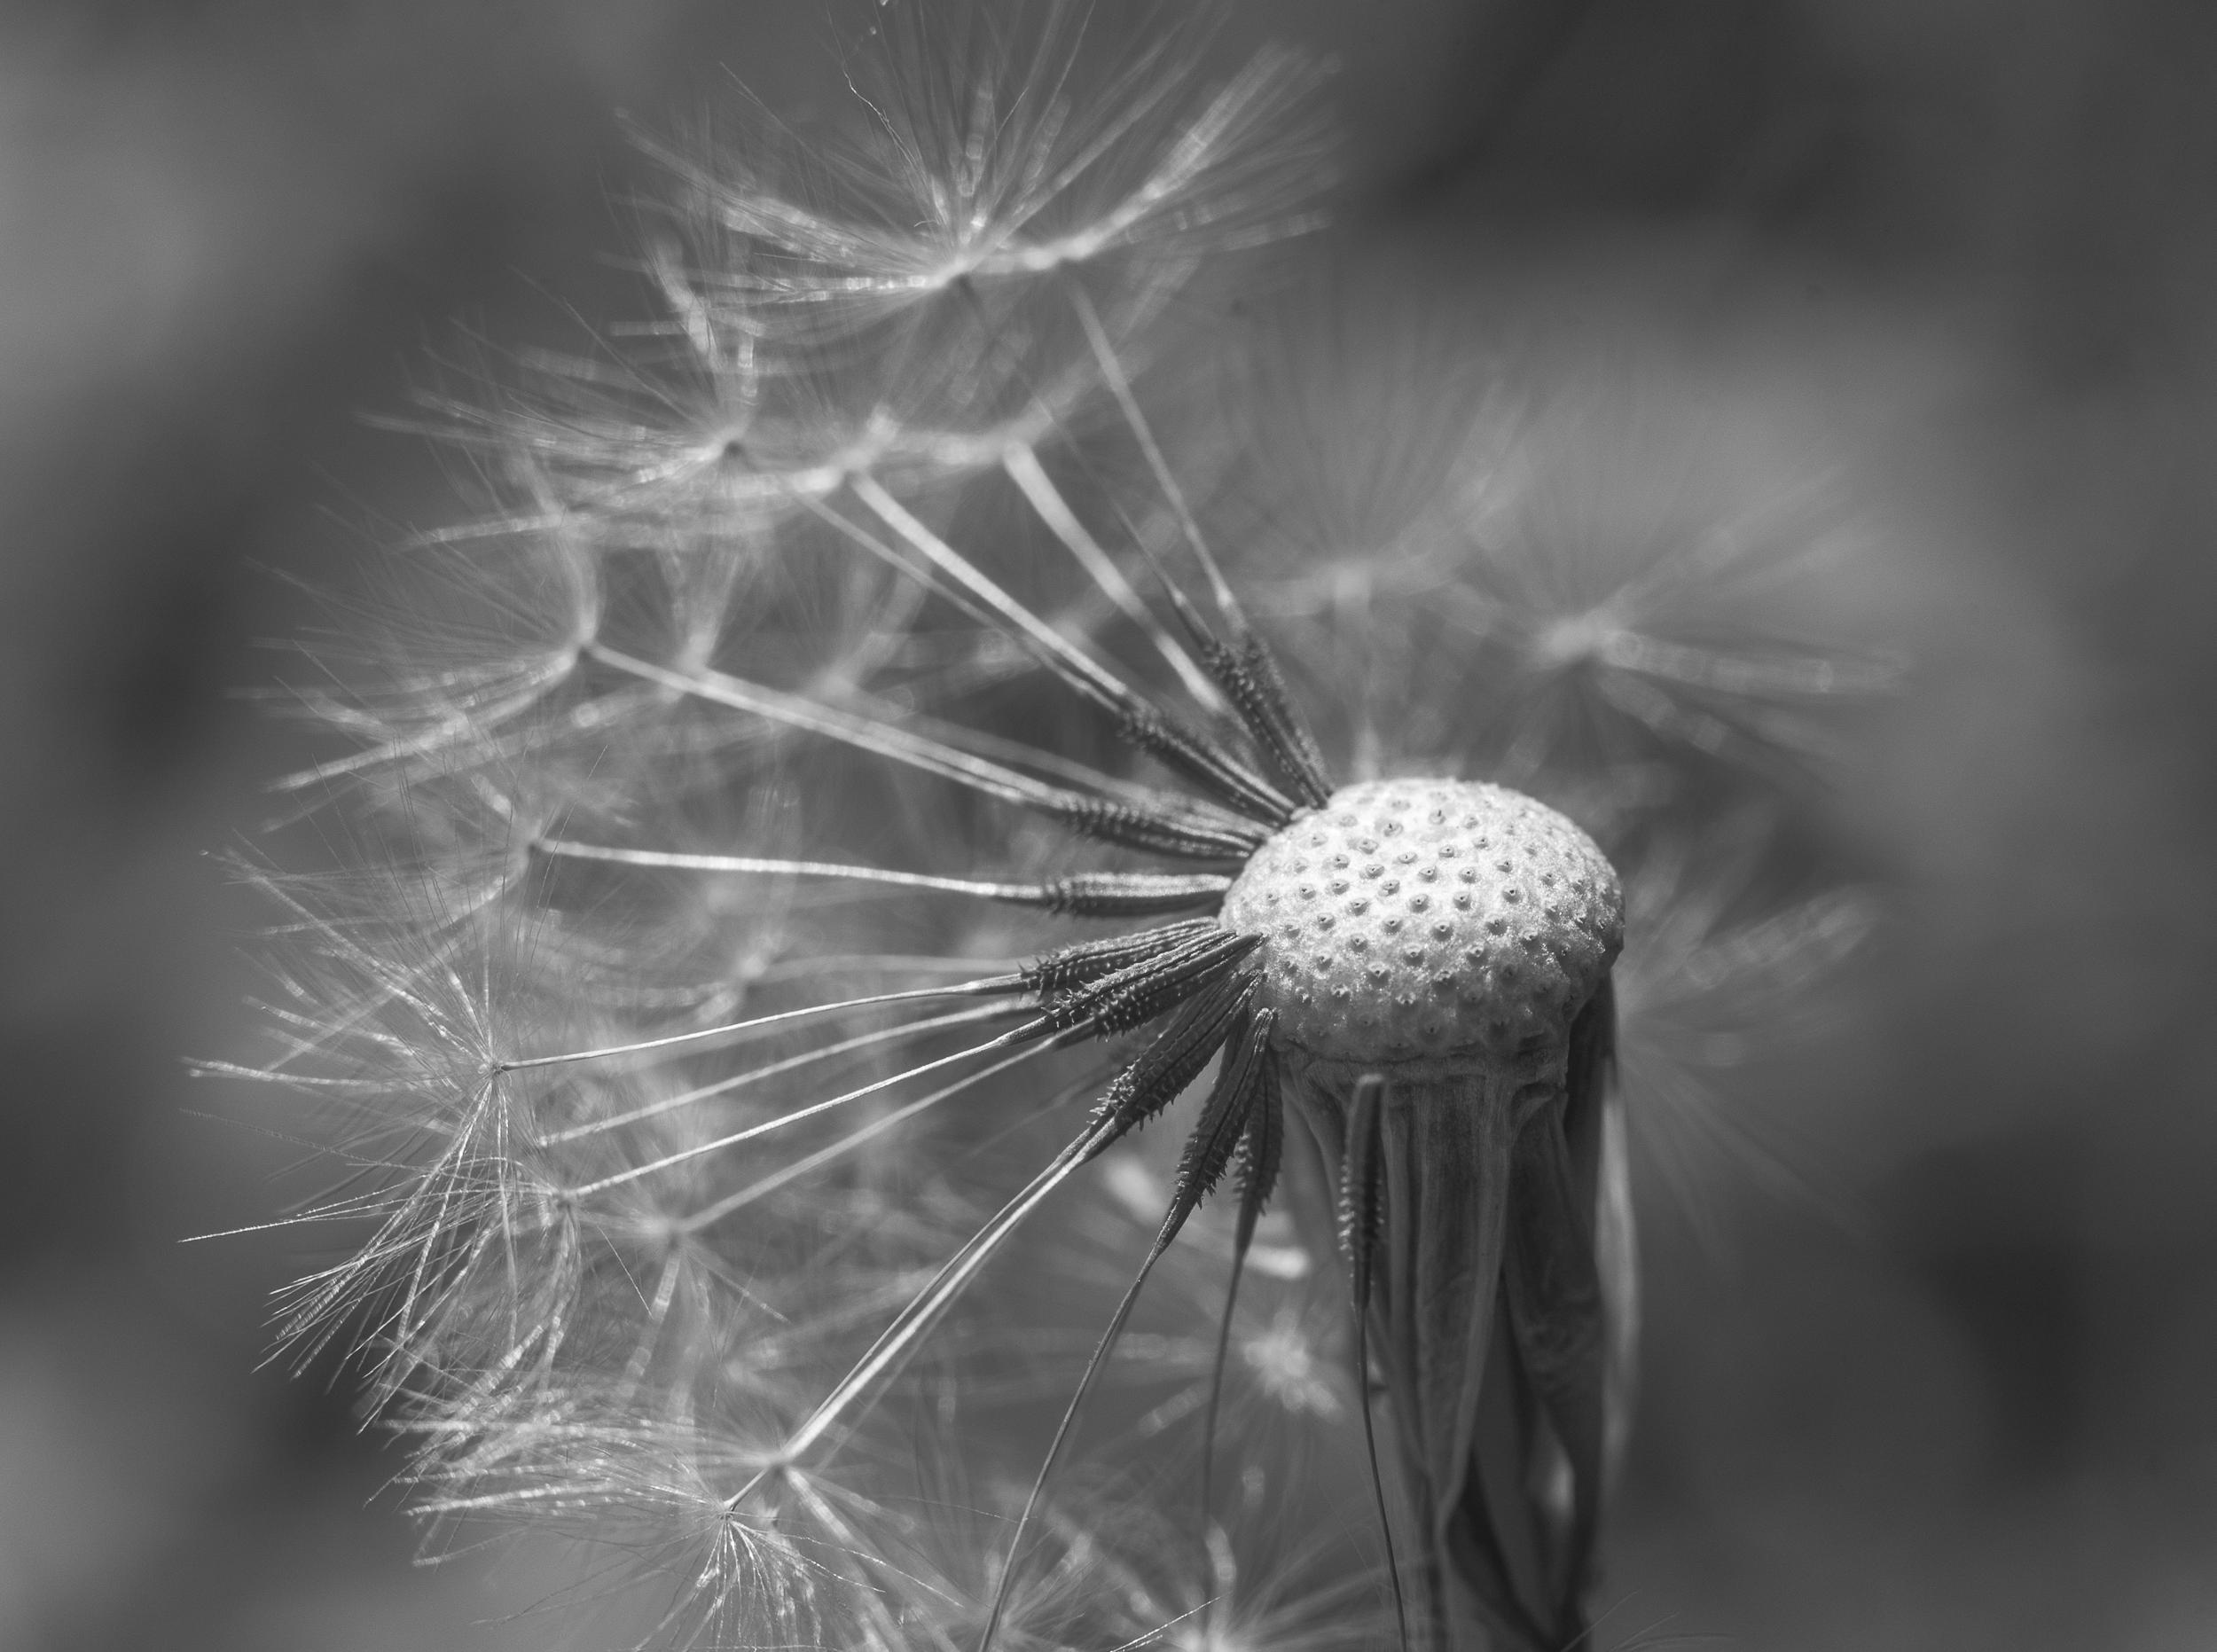 Free images nature blossom light black and white dandelion leaf flower bloom europe color peace serene nikon closeup flora close up